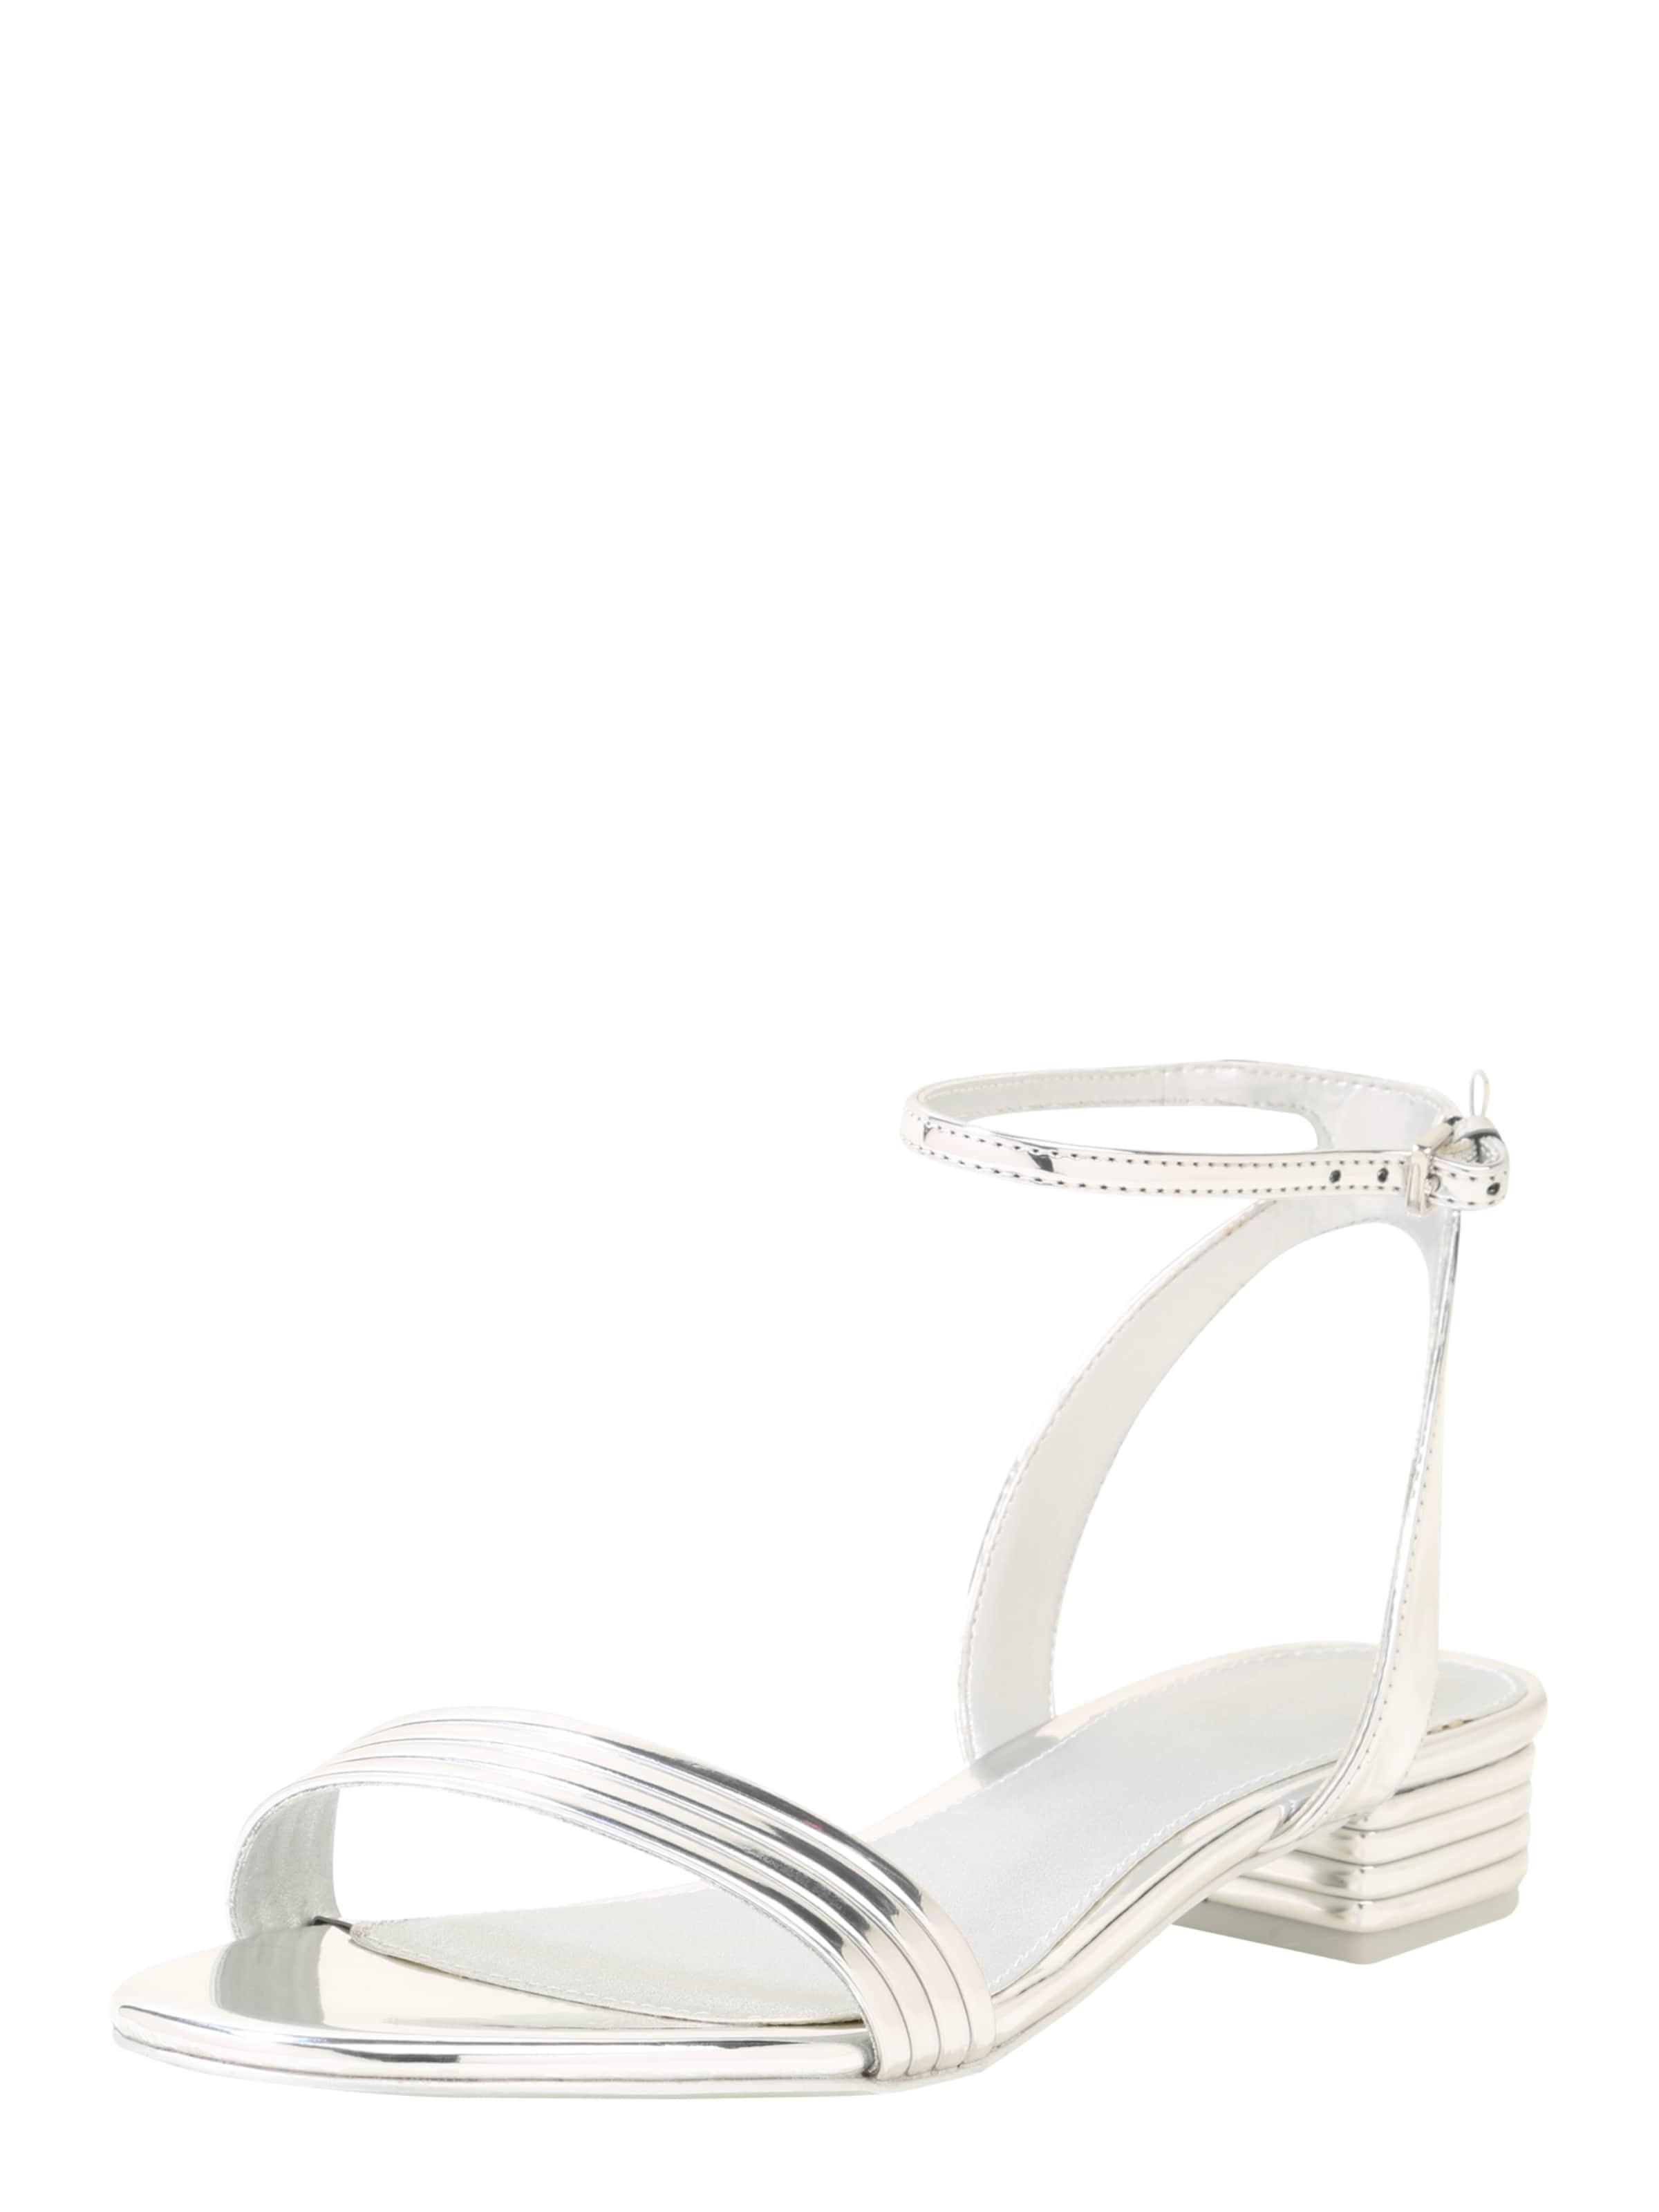 Haltbare Mode billige Schuhe ALDO   Riemchensandalen Schuhe 'Izzie' Schuhe Gut getragene Schuhe Riemchensandalen 787ac1